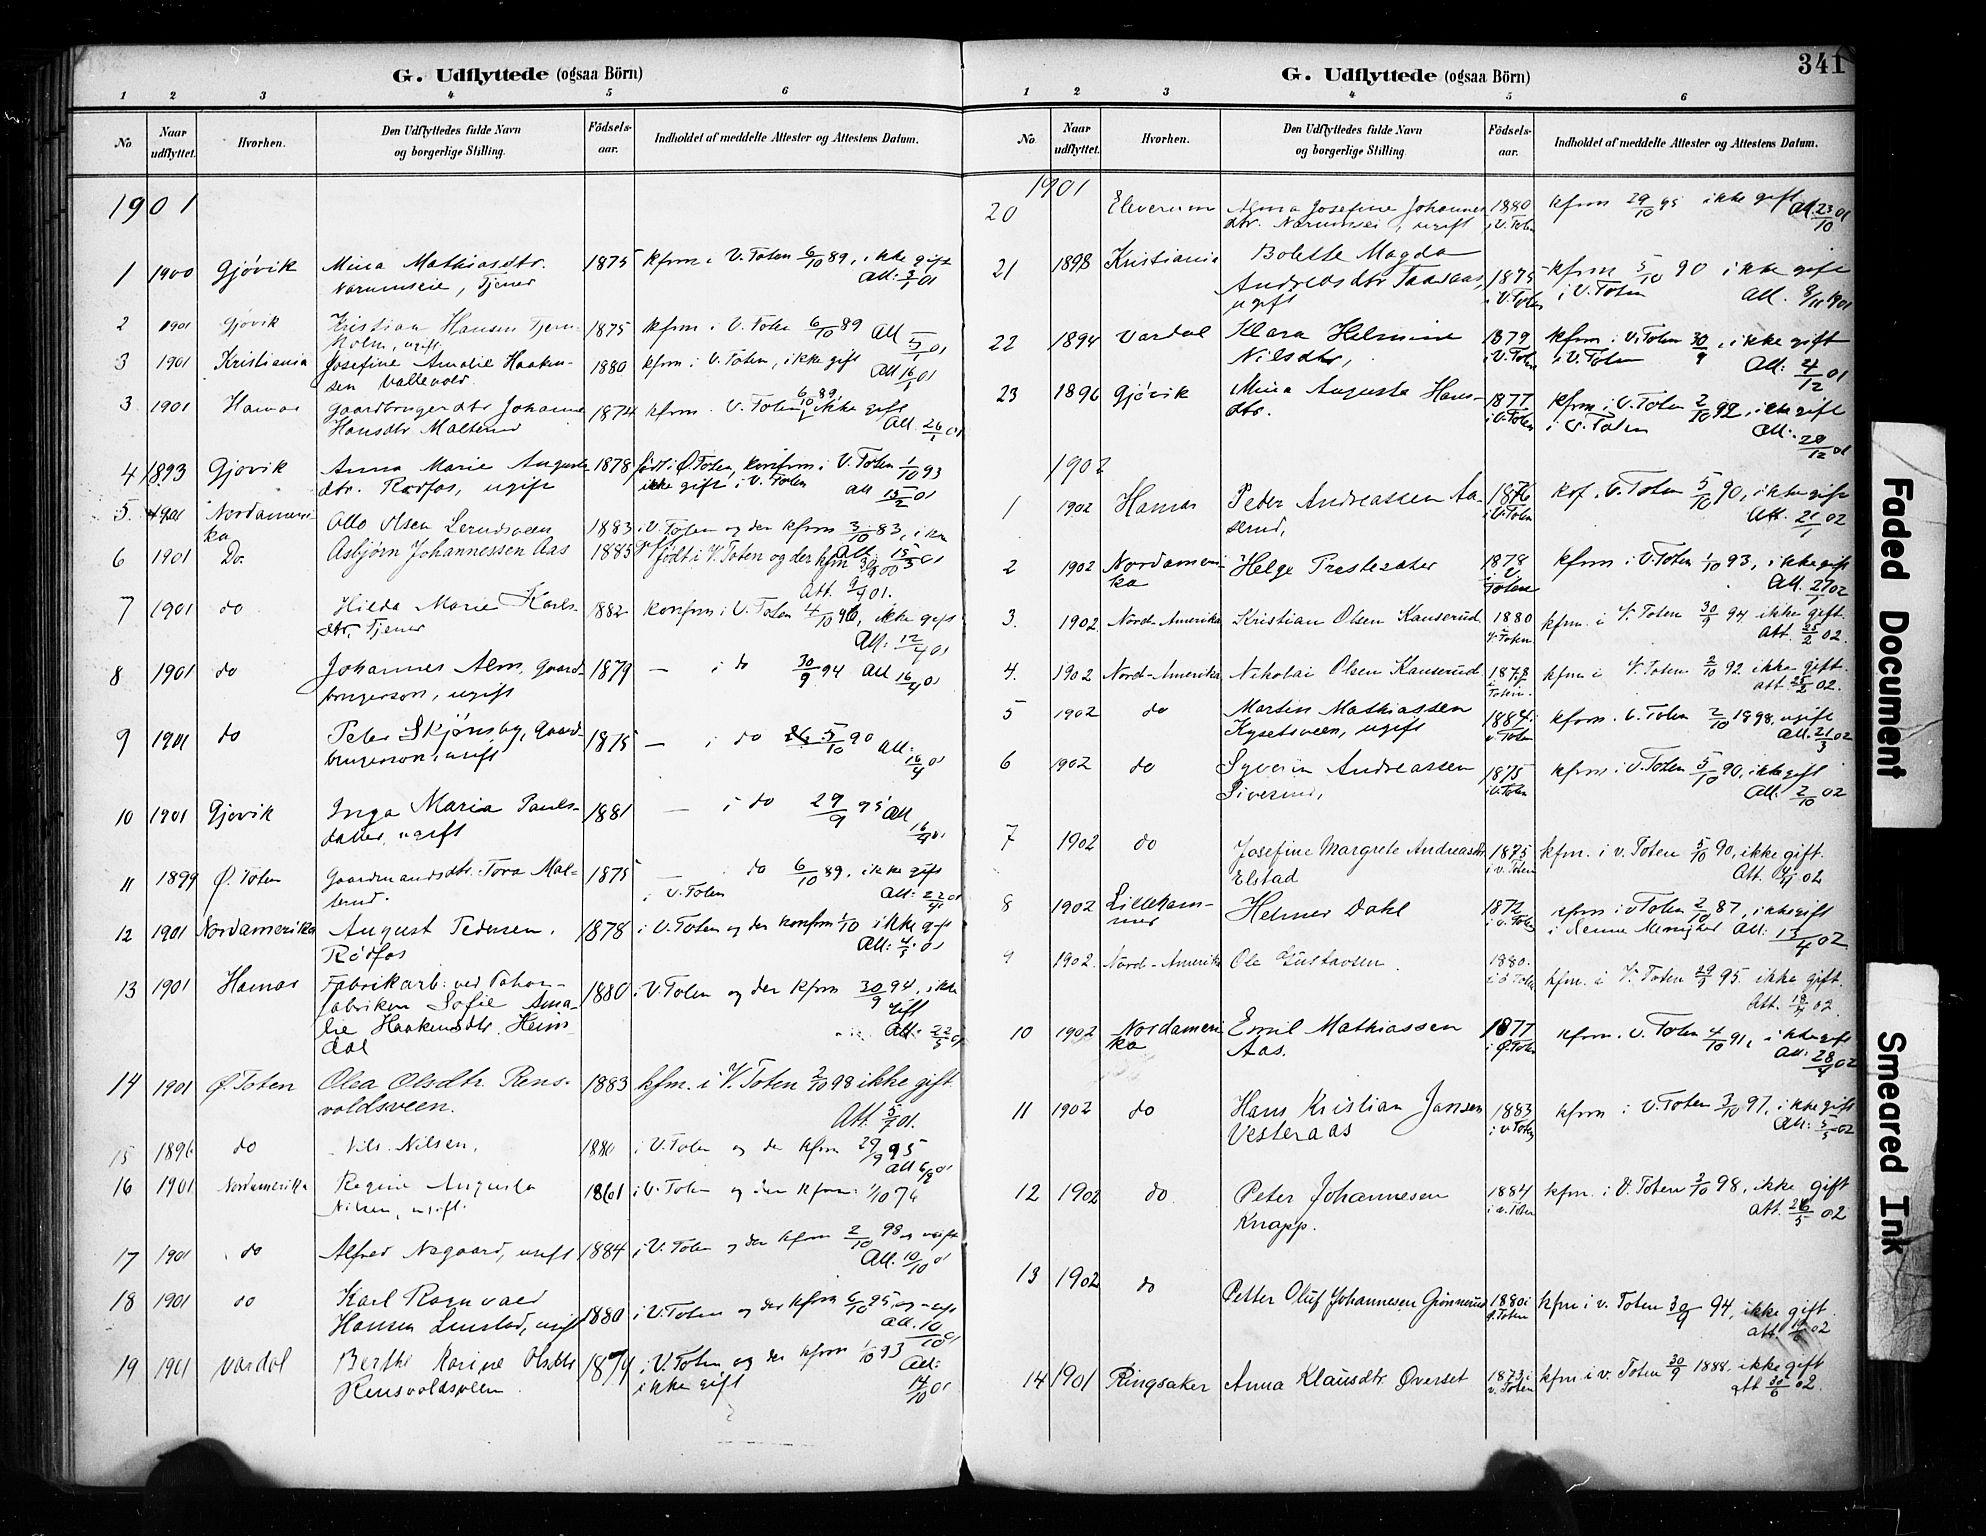 SAH, Vestre Toten prestekontor, H/Ha/Haa/L0011: Ministerialbok nr. 11, 1895-1906, s. 341